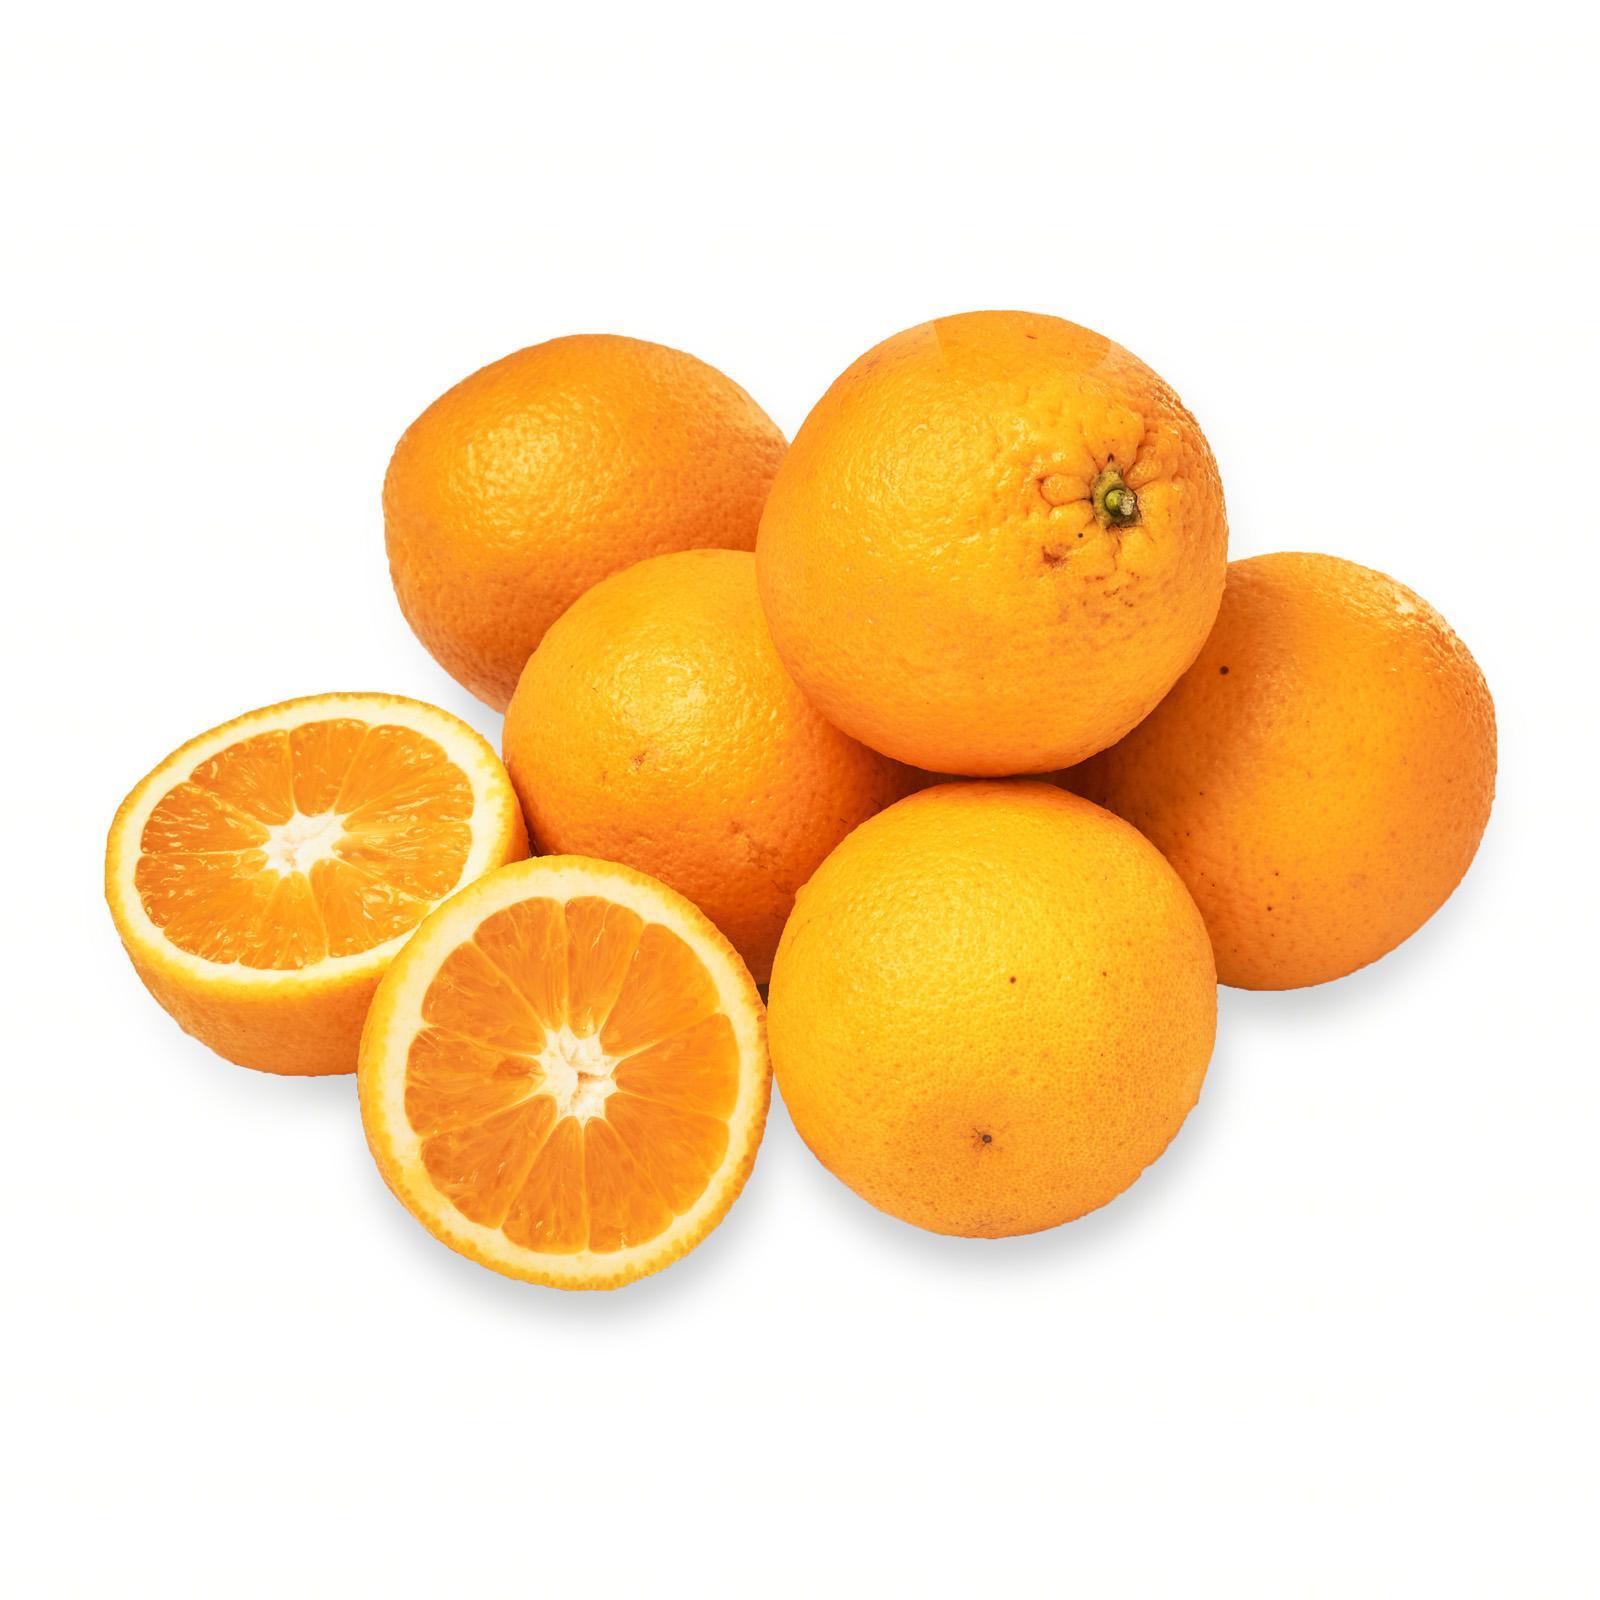 Sunkist Valencia Orange